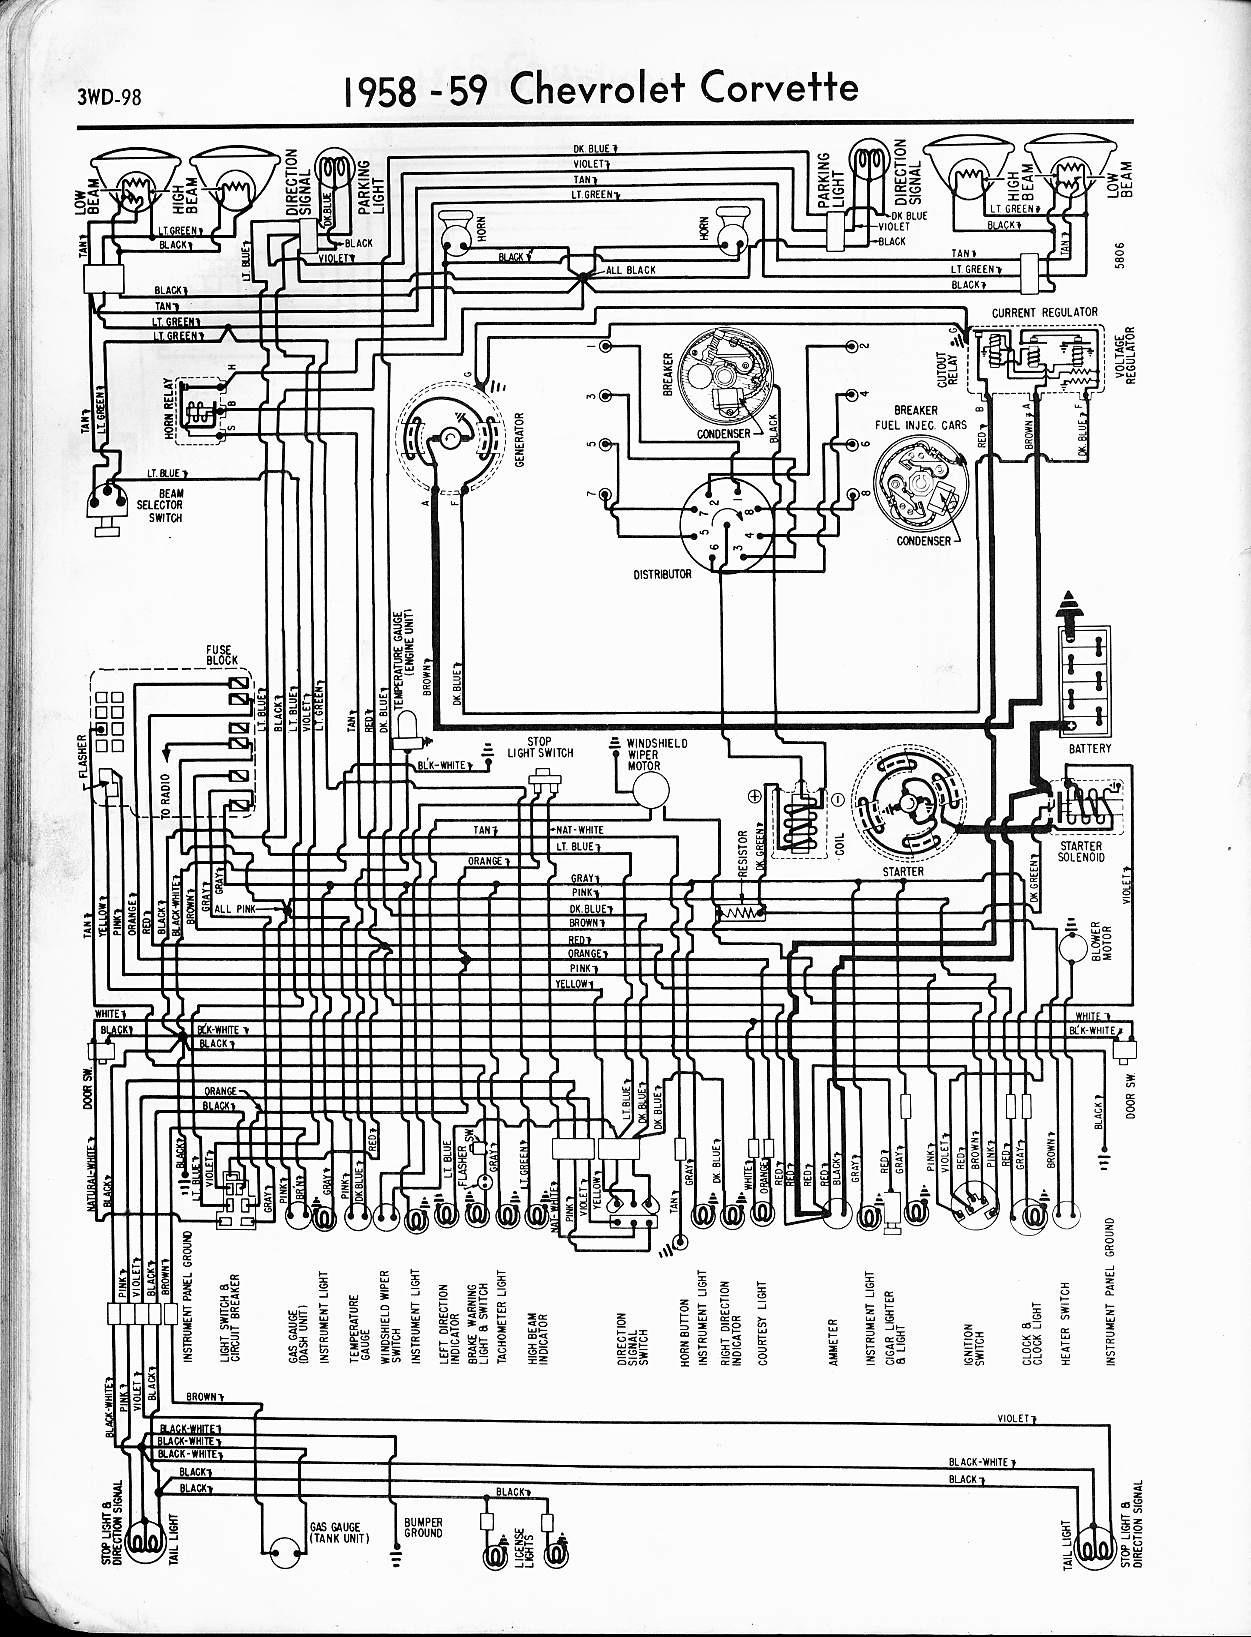 Car cigarette lighter wiring diagram 57 65 chevy wiring diagrams of car cigarette lighter wiring diagram